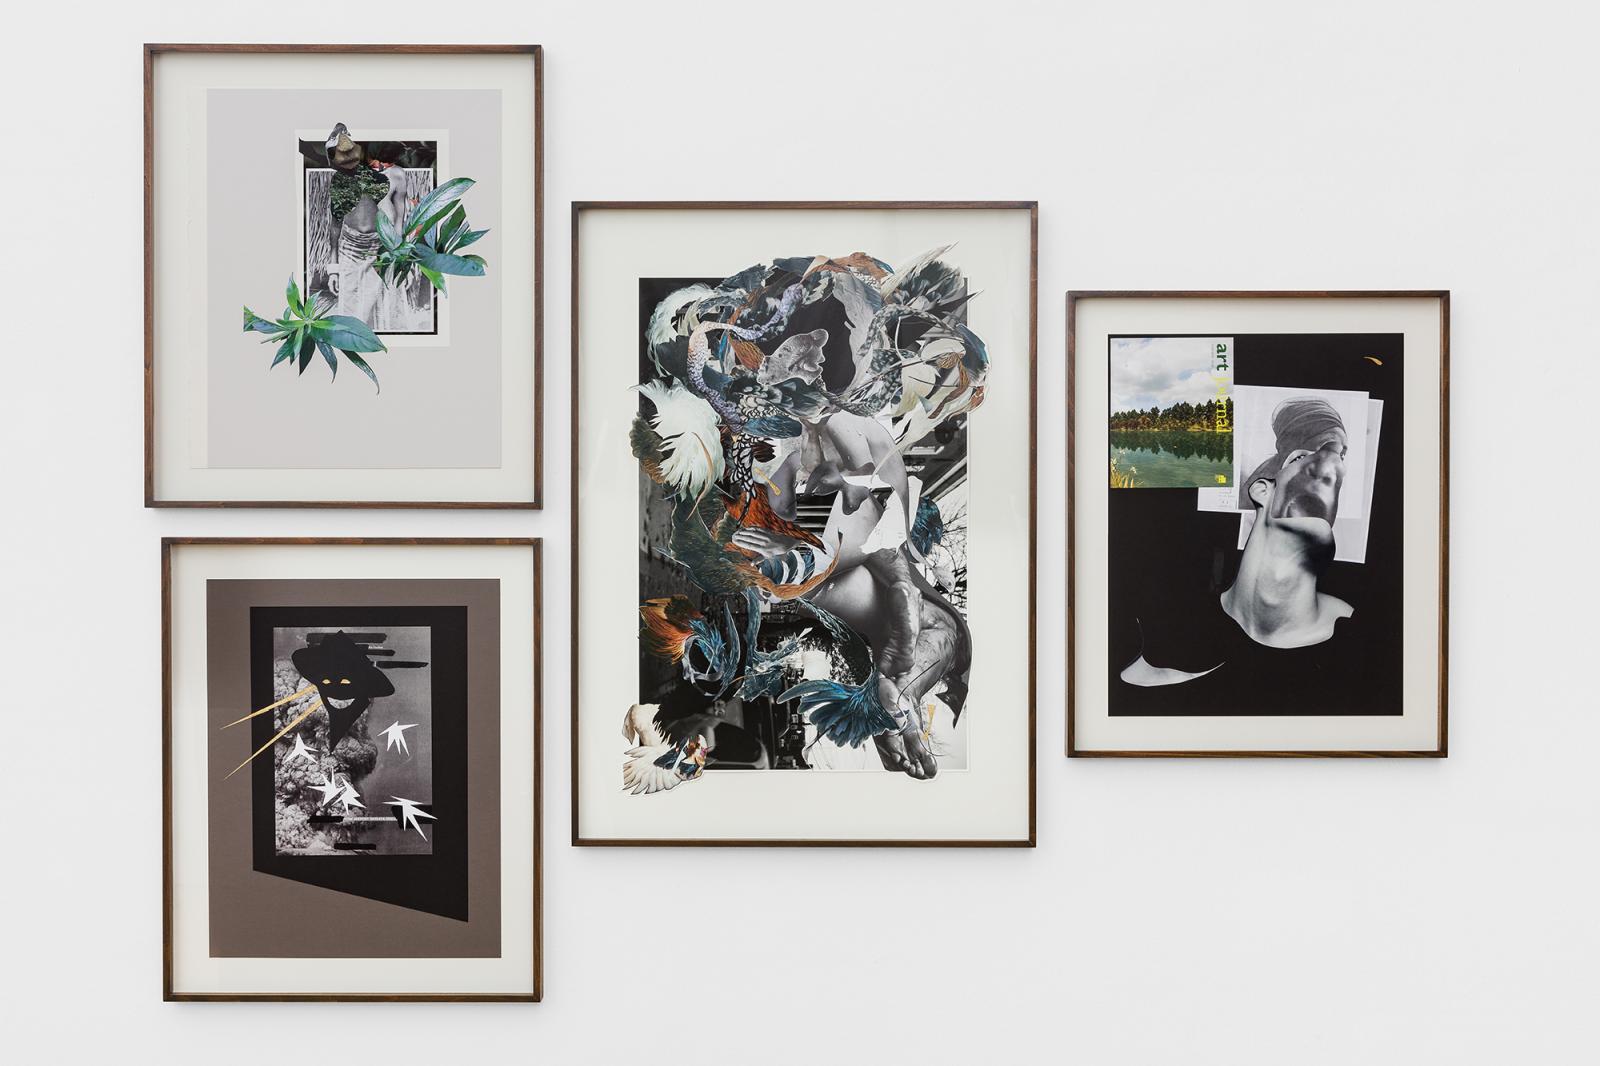 Georg Kargl Fine Arts, curated by Alistair Hicks; Marcia Kure, /For Southern Kaduna I-IV/, 2017 – 2020; courtesy of the artist and Susan Inglett Gallery; © Georg Kargl Fine Arts  Photo kunst-dokumentation.com